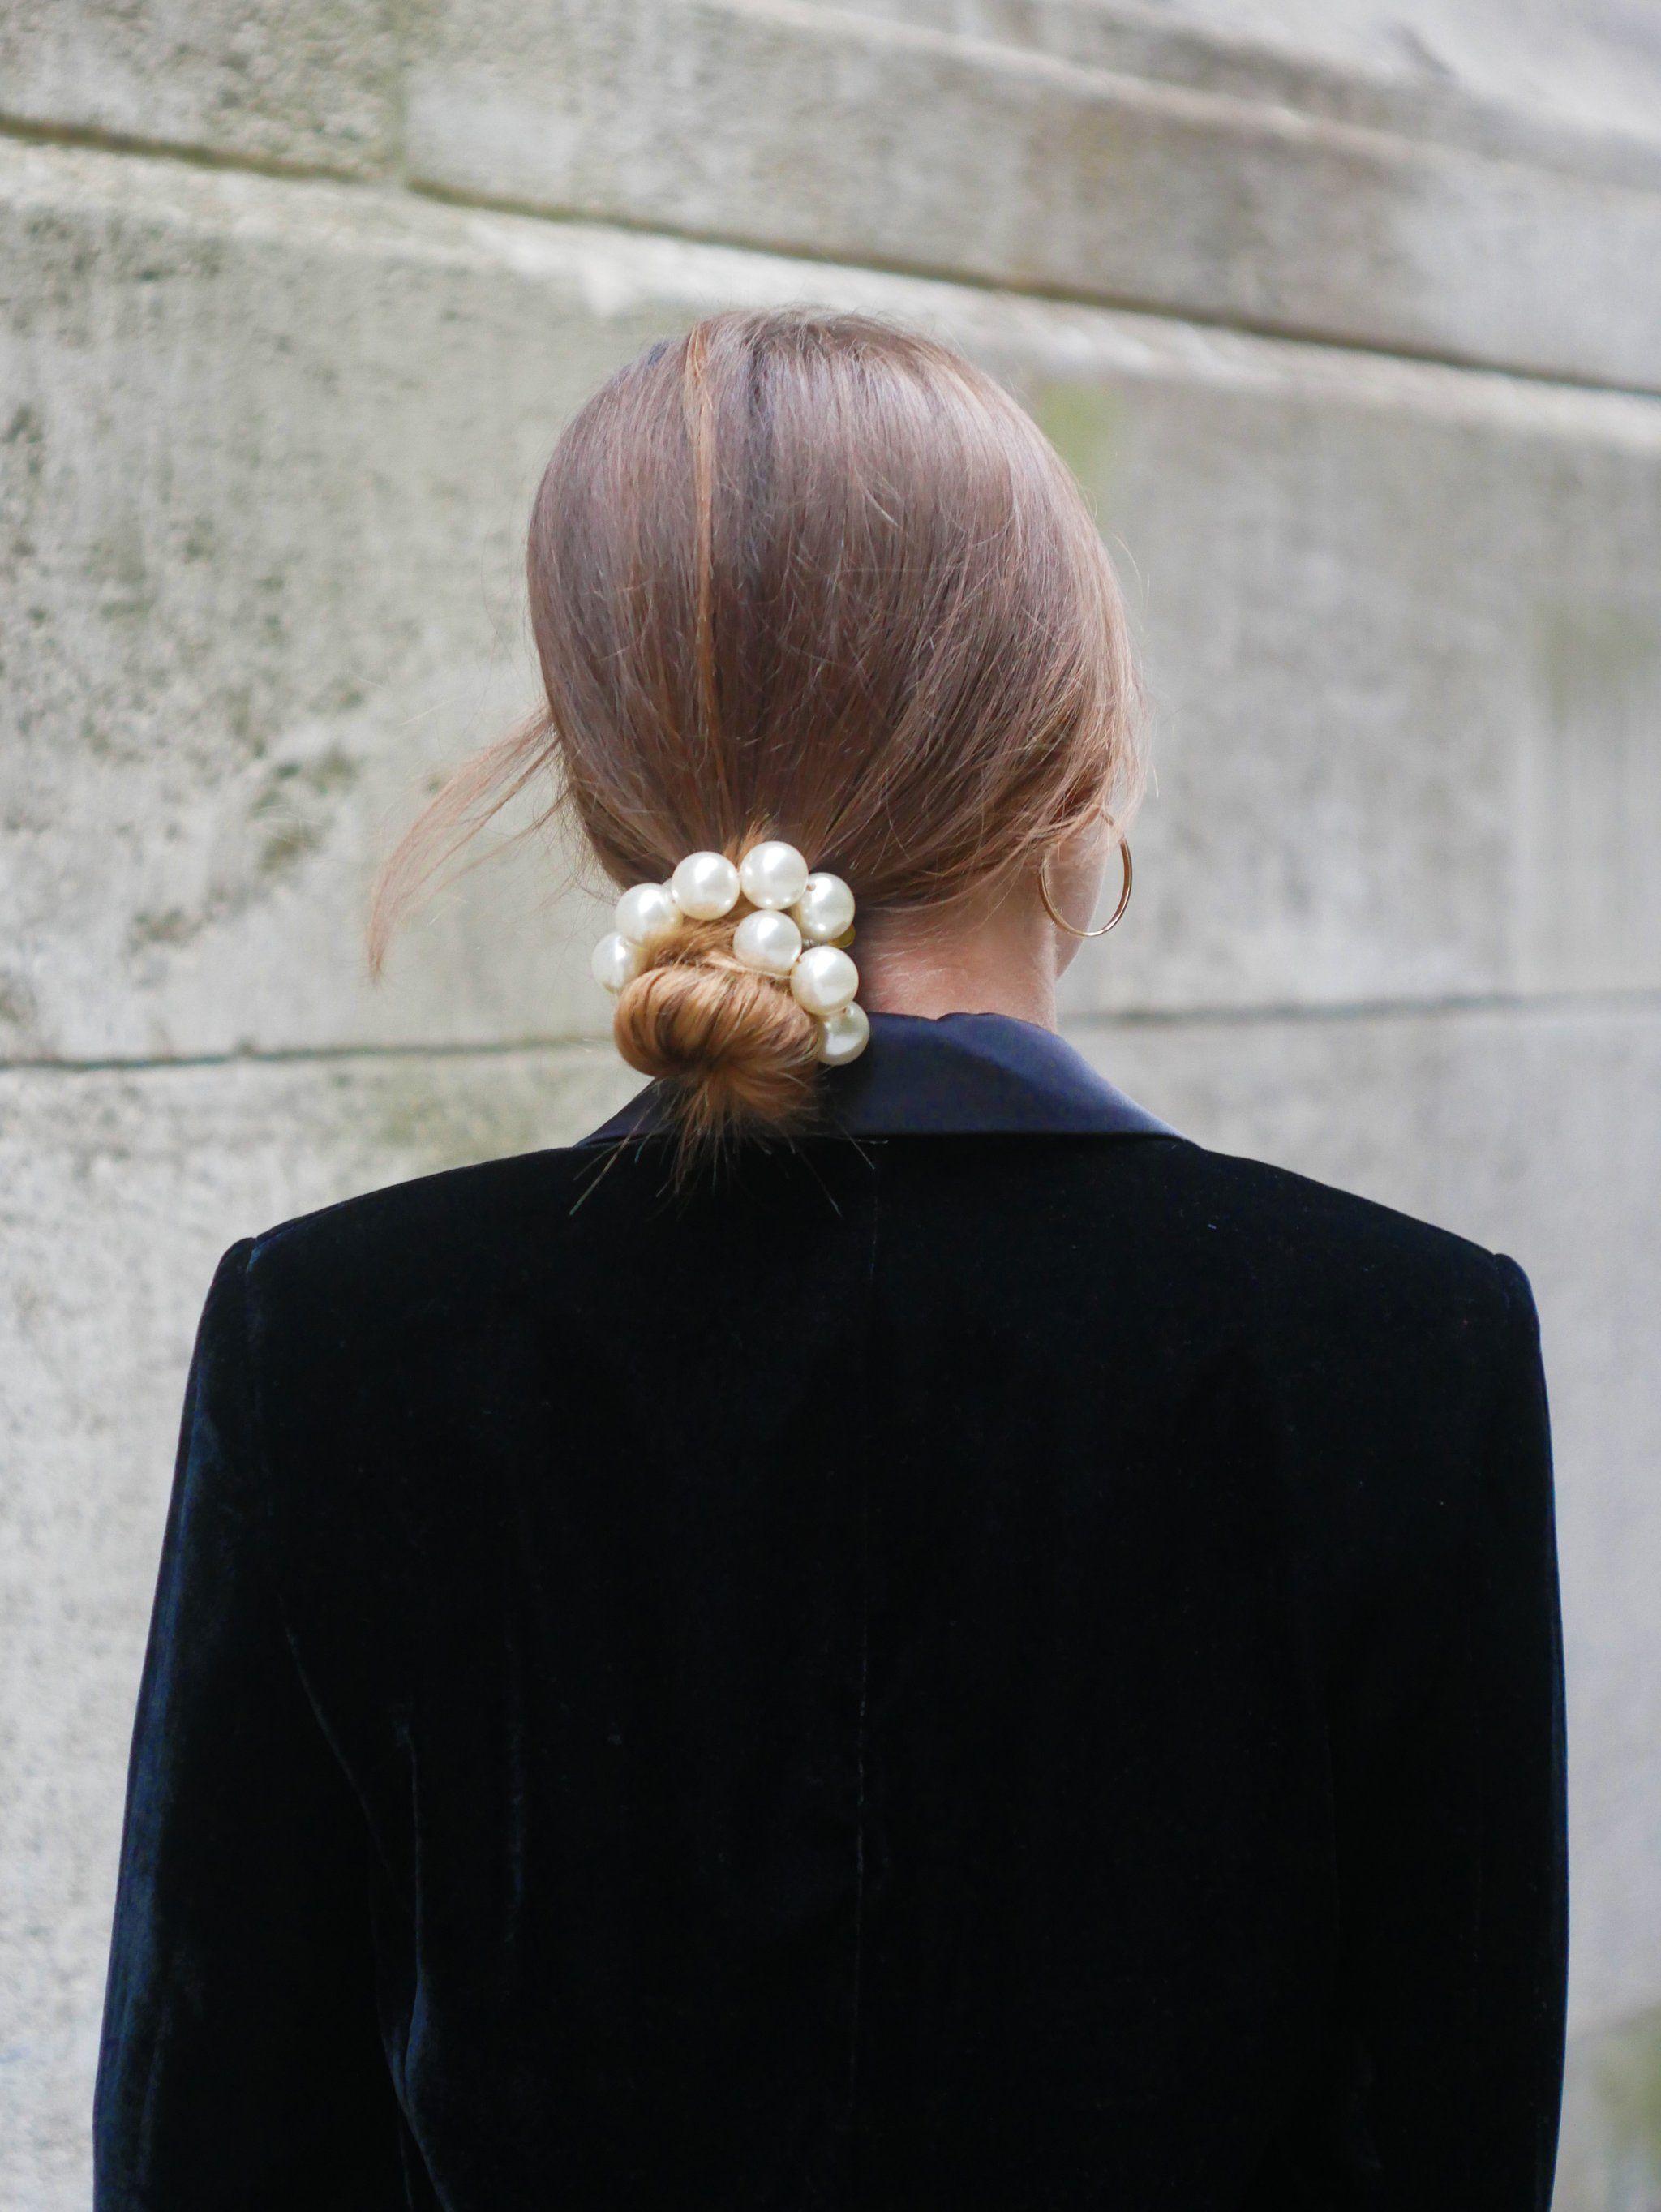 40+ Lola coiffure inspiration